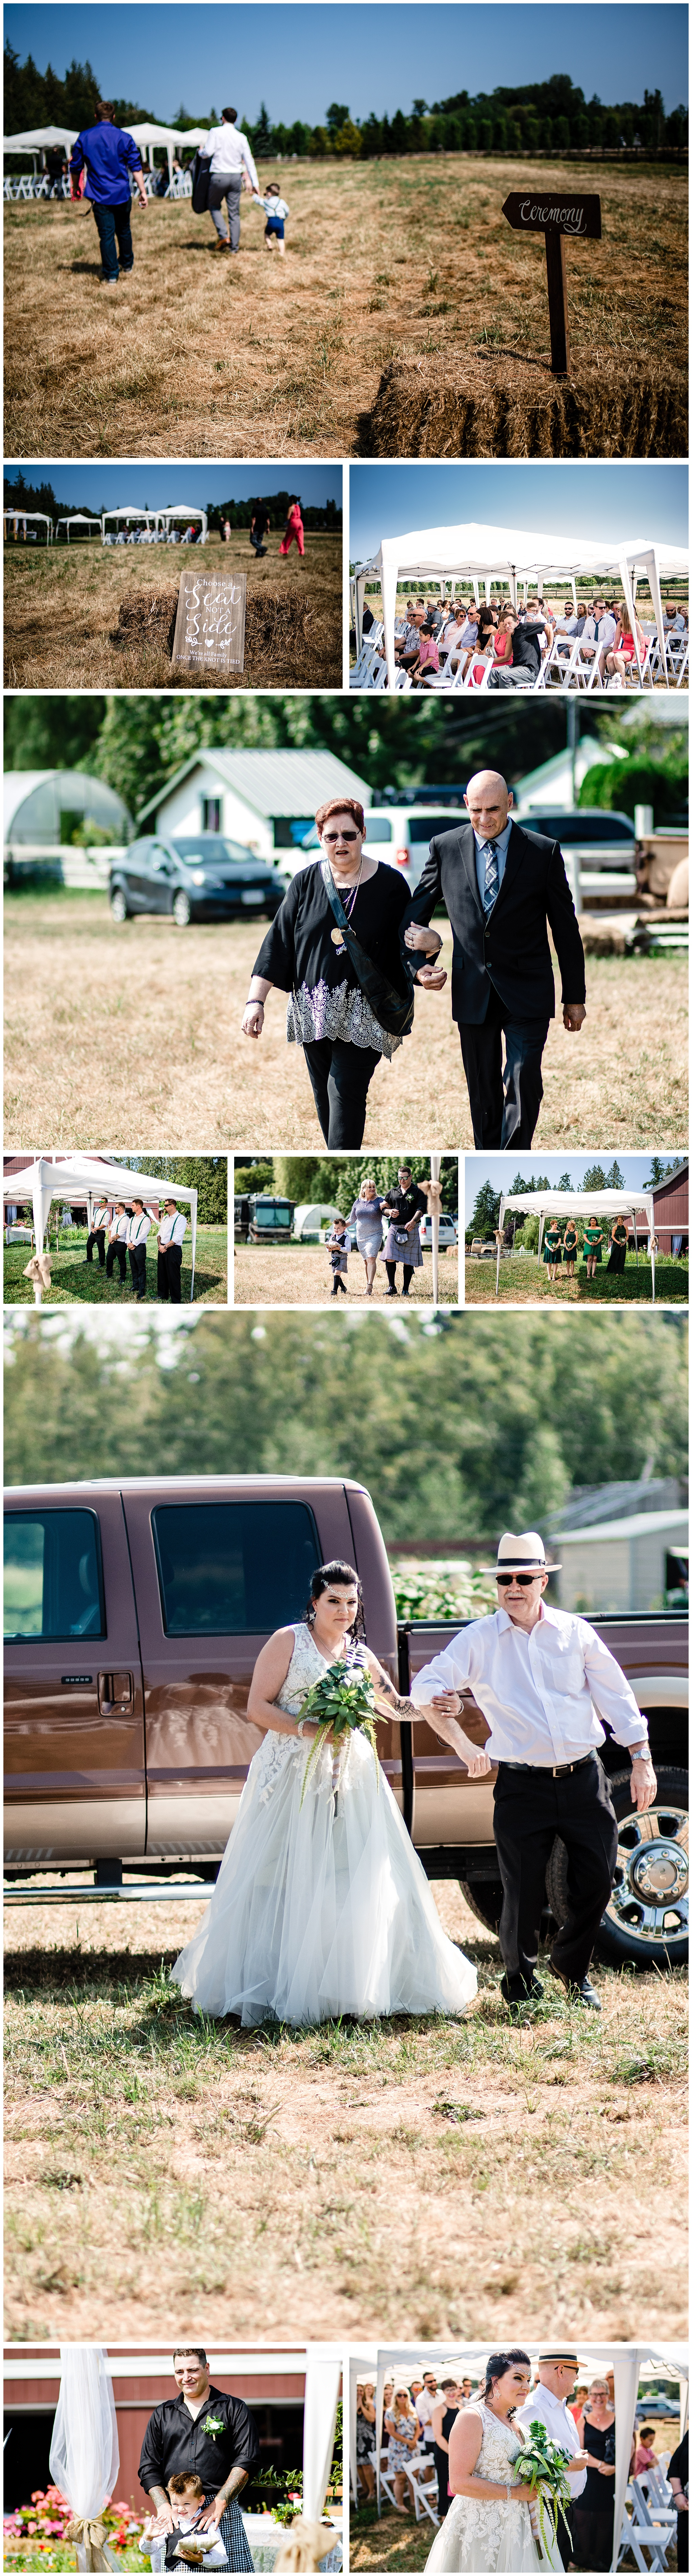 White-Owl-Barn-langley-bc-wedding-photographer-rustic-bbq-foodtruck-scottish-emerald-green-drinks_0001.jpg